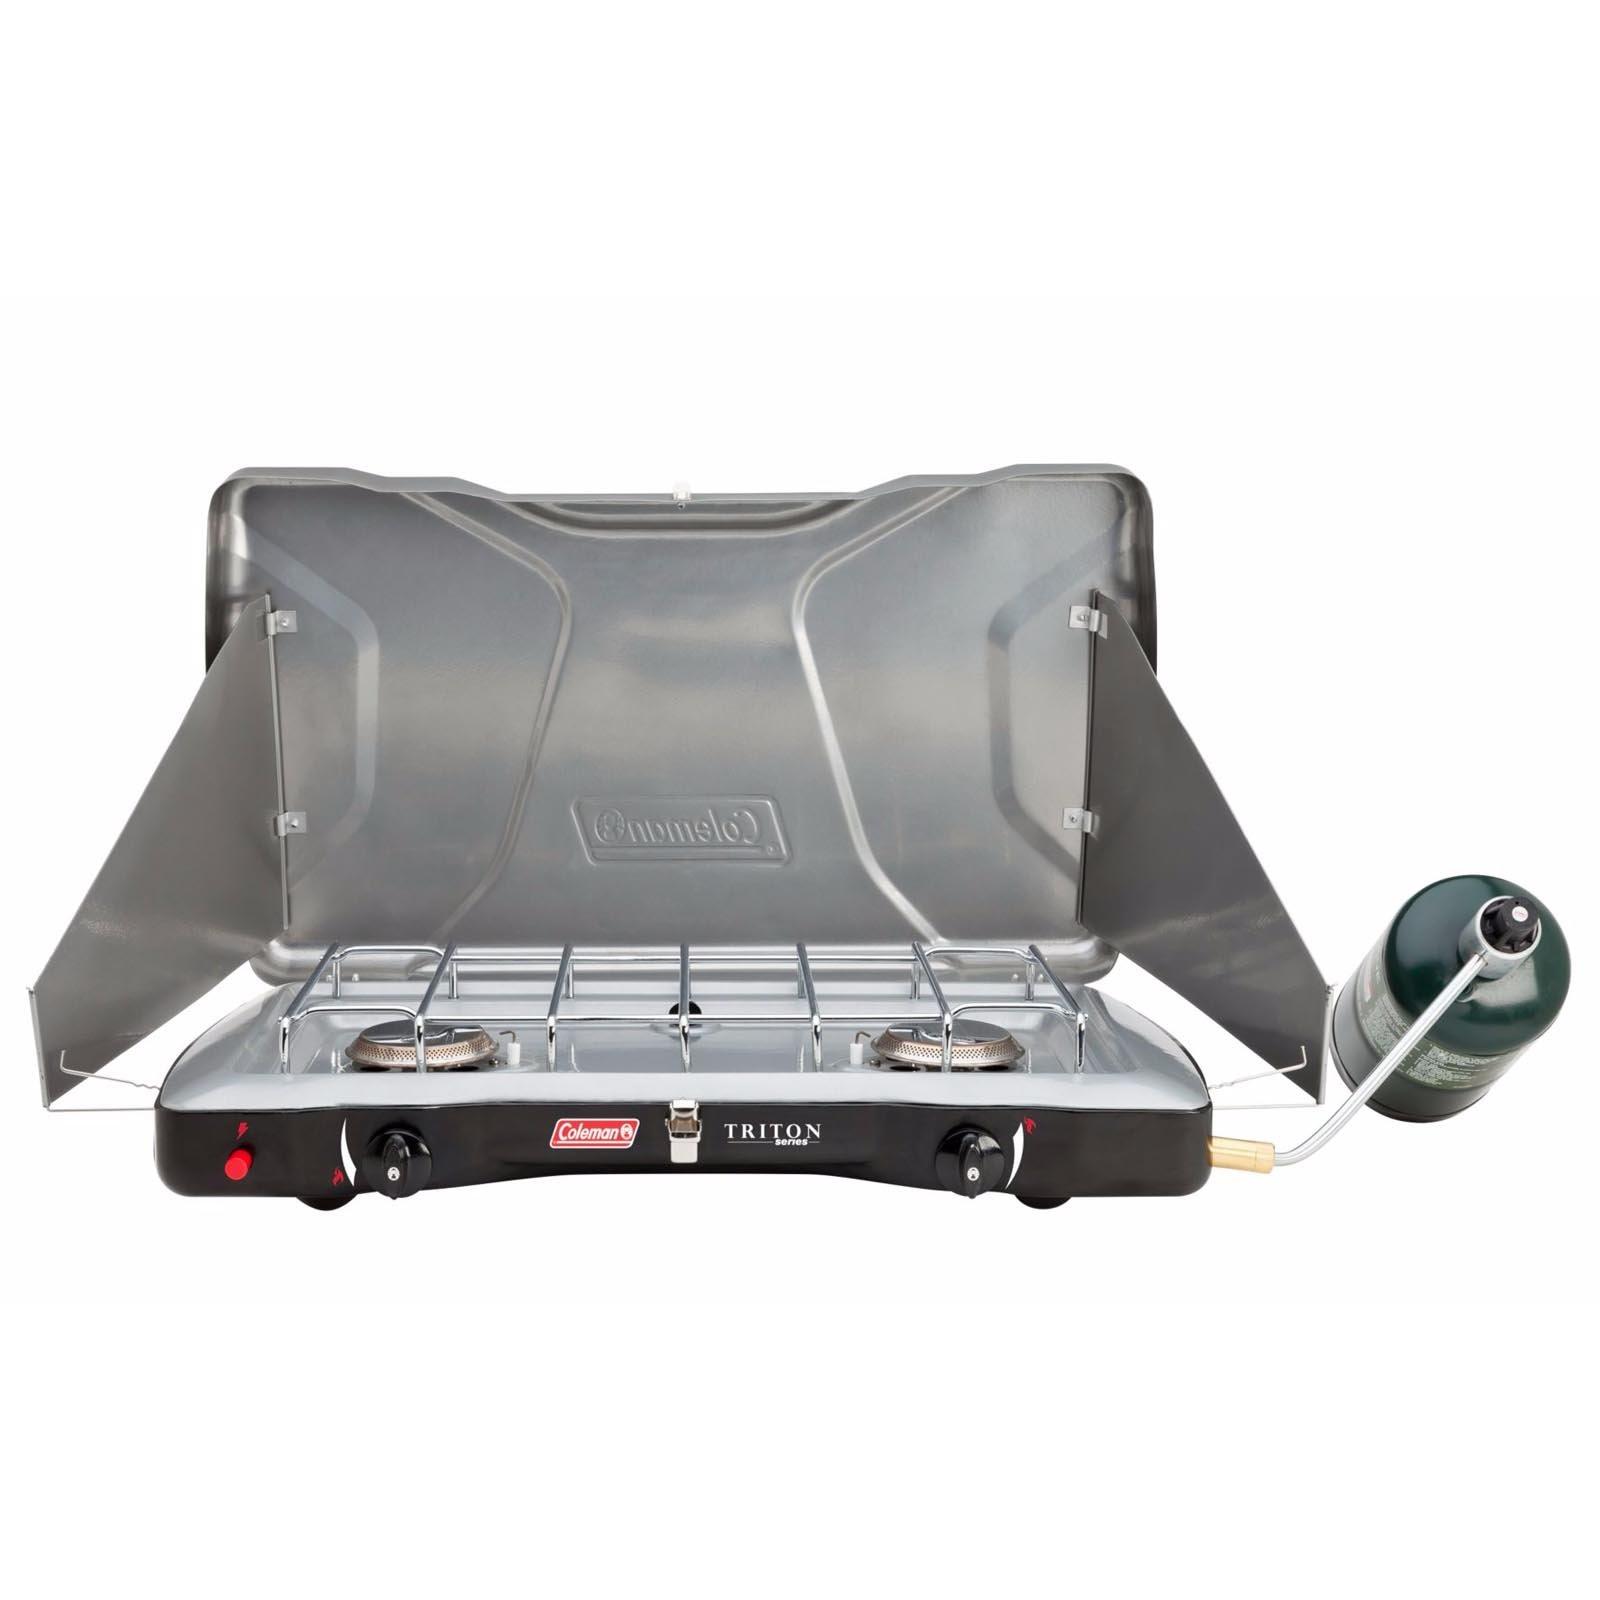 Coleman Portable Triton + Propane Gas Camping Stove (3 Set)